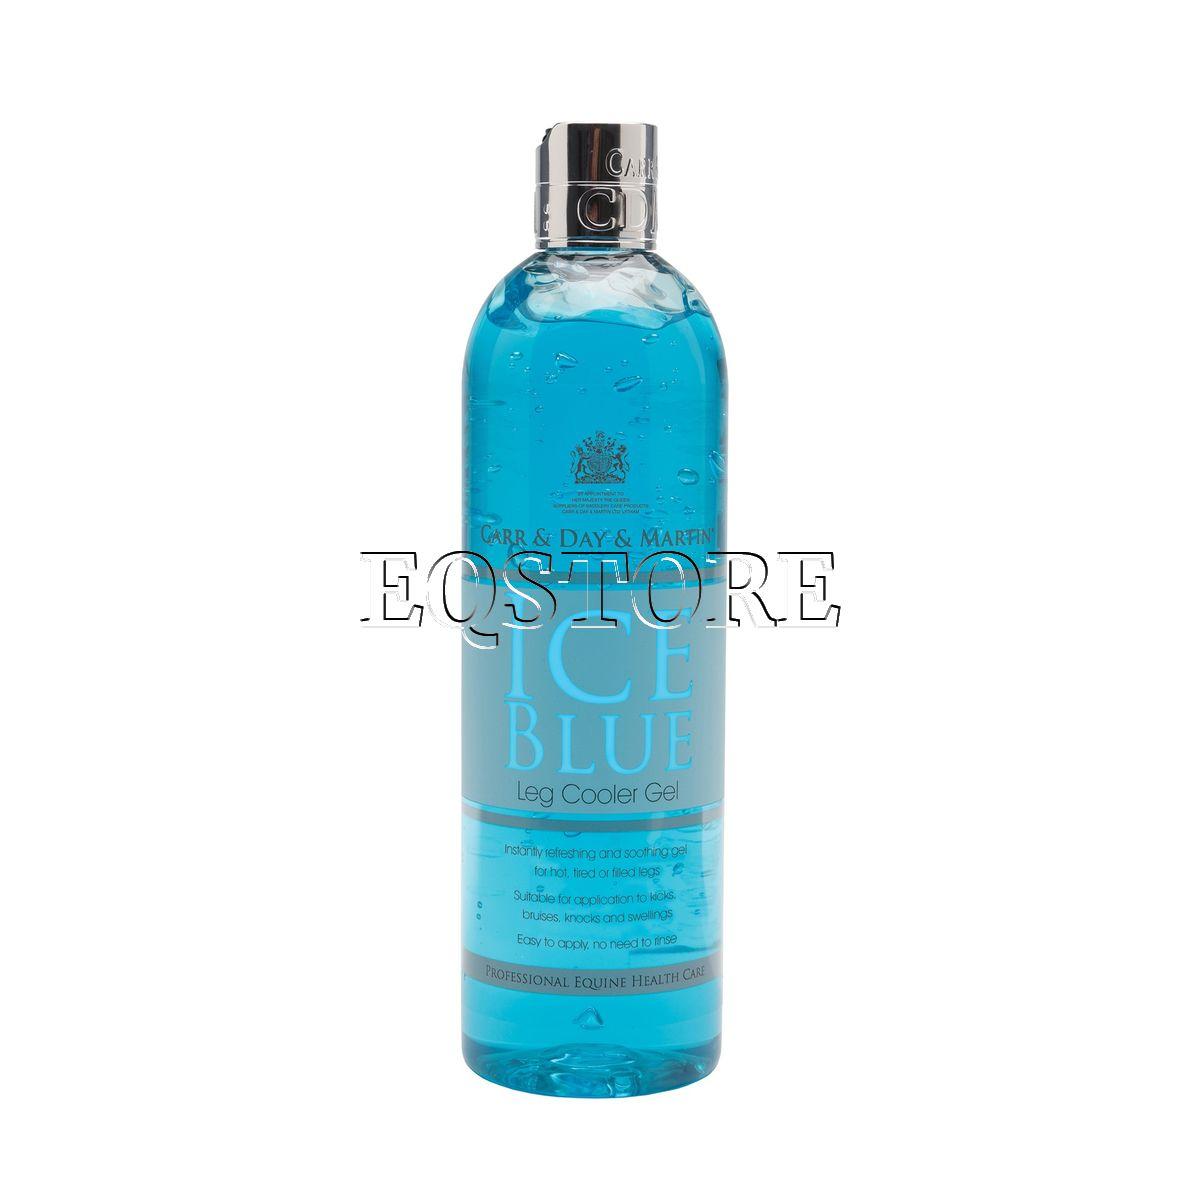 Ice Blue Leg Cooling Gel (Голубой охлаждающий гель)